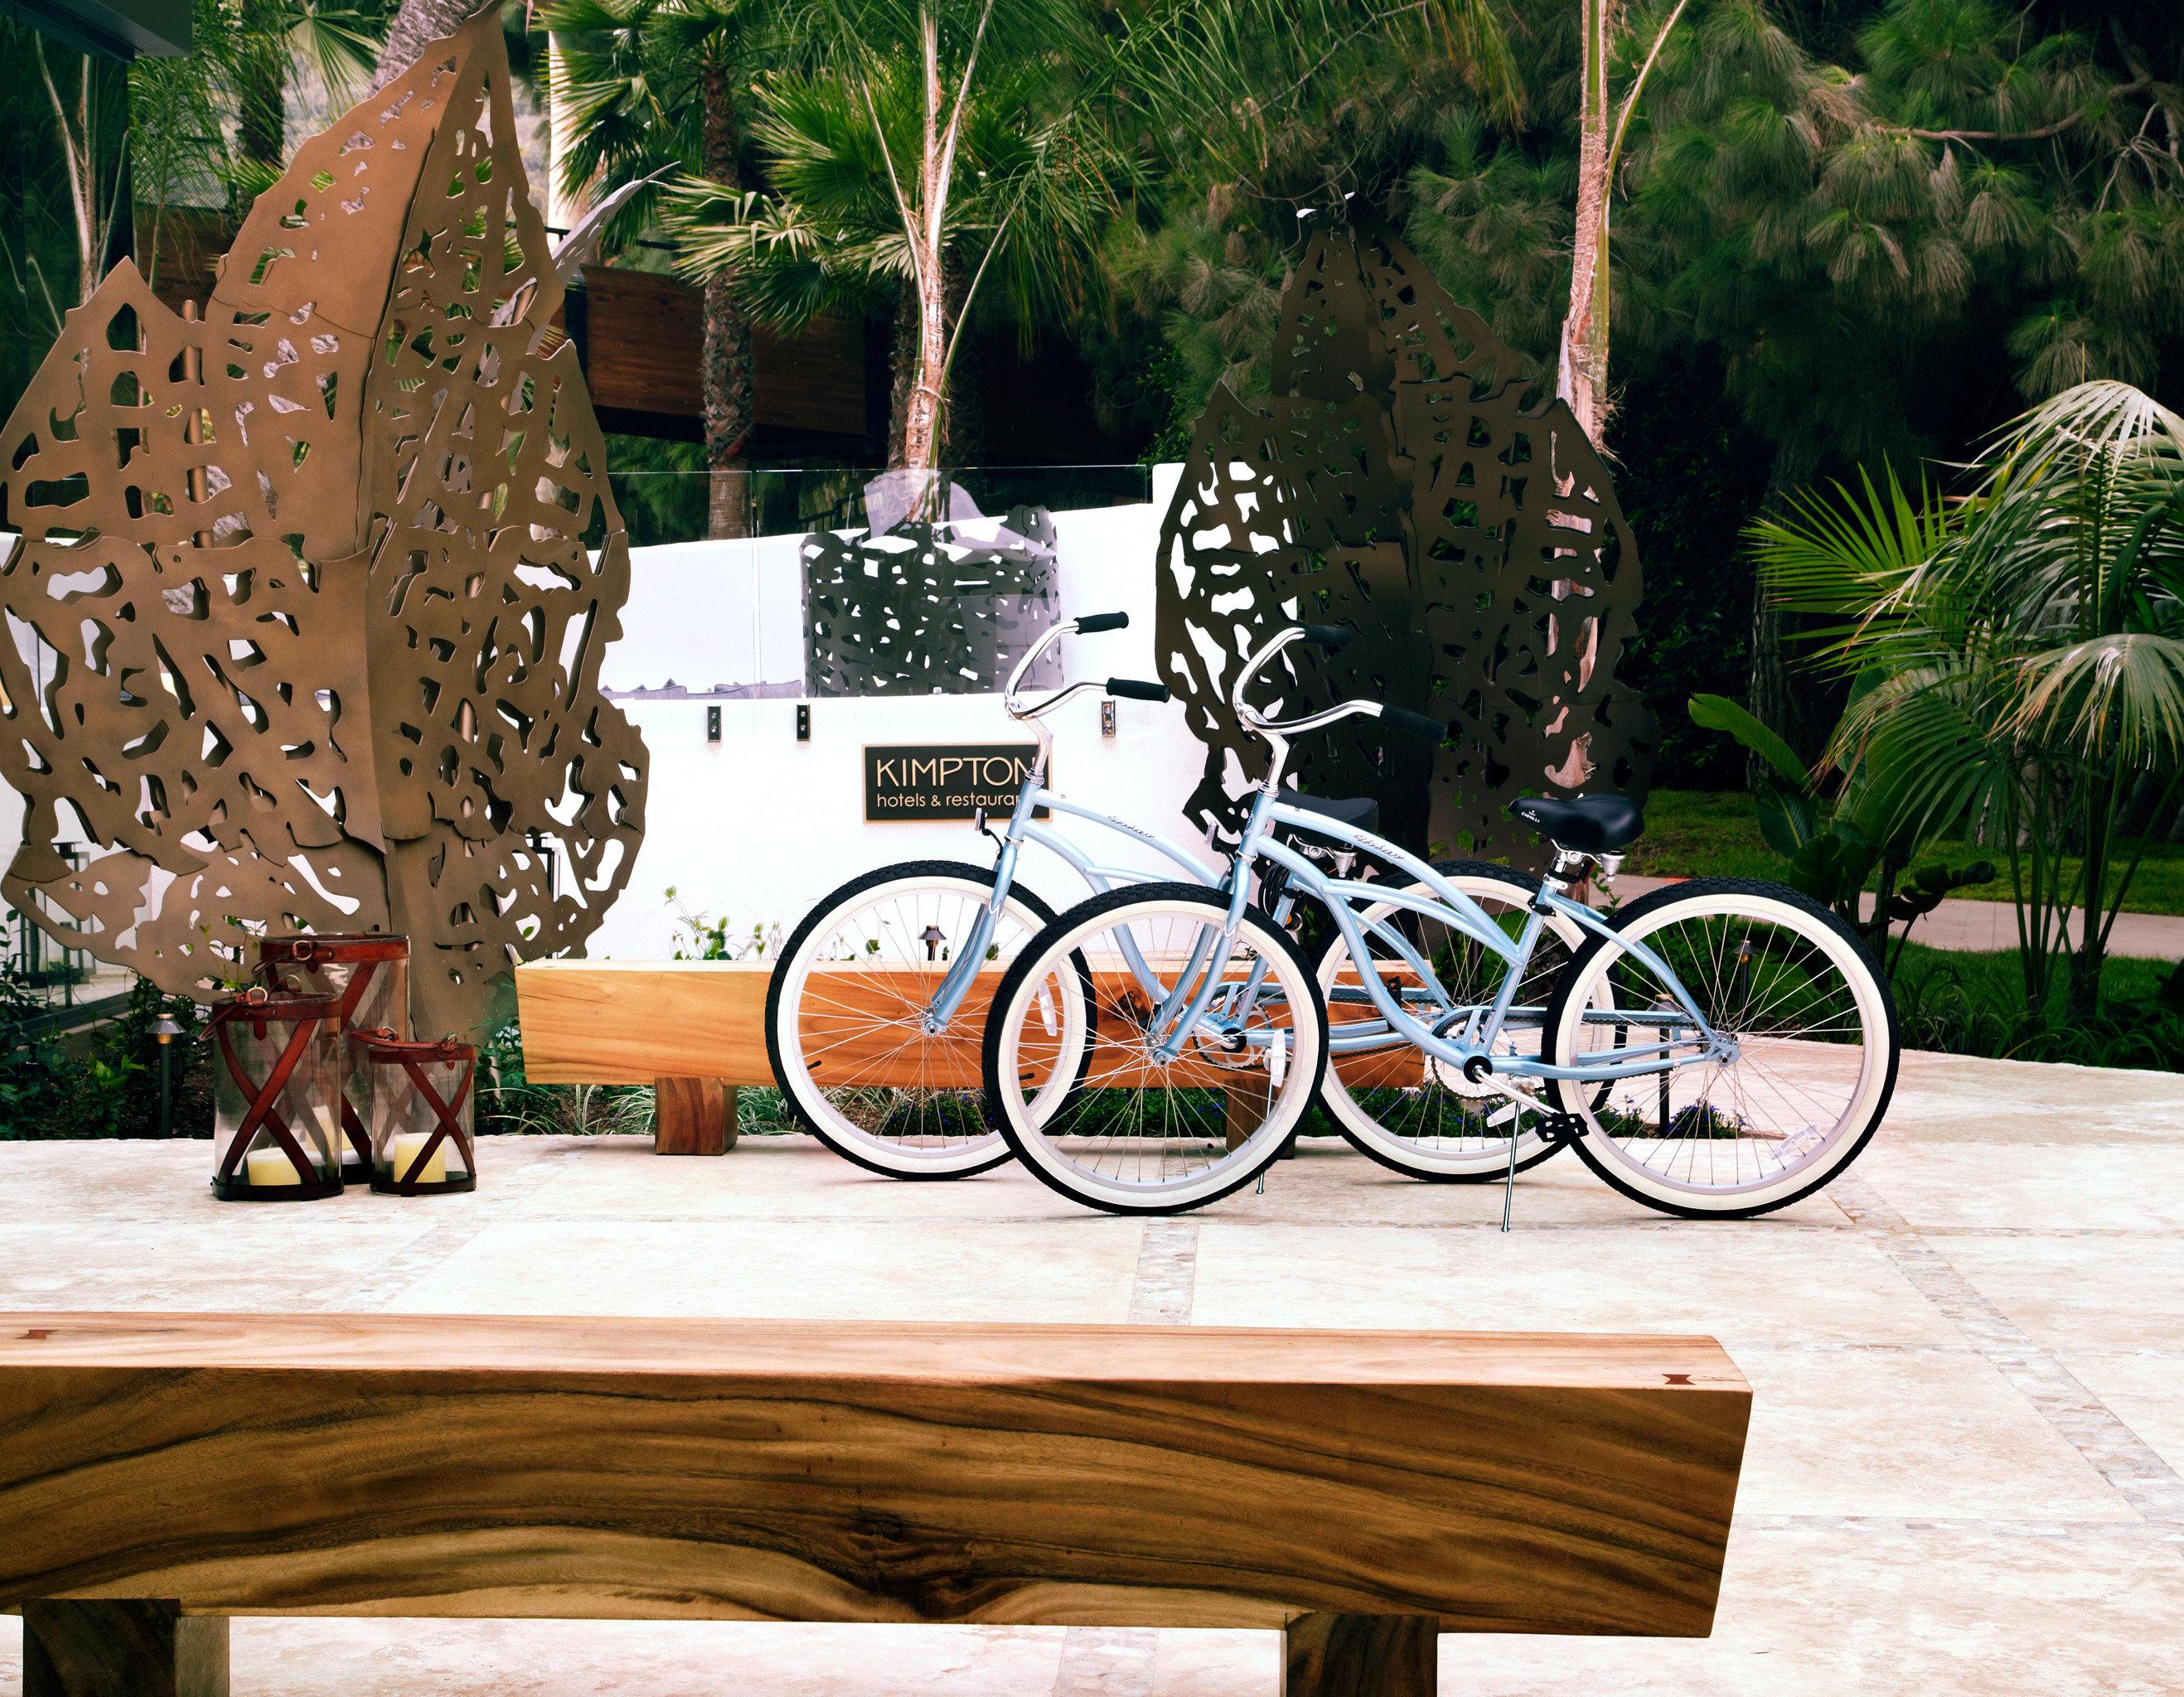 Grounds Hip Hotels Outdoors Sport Wellness tree outdoor ground vehicle art wood home